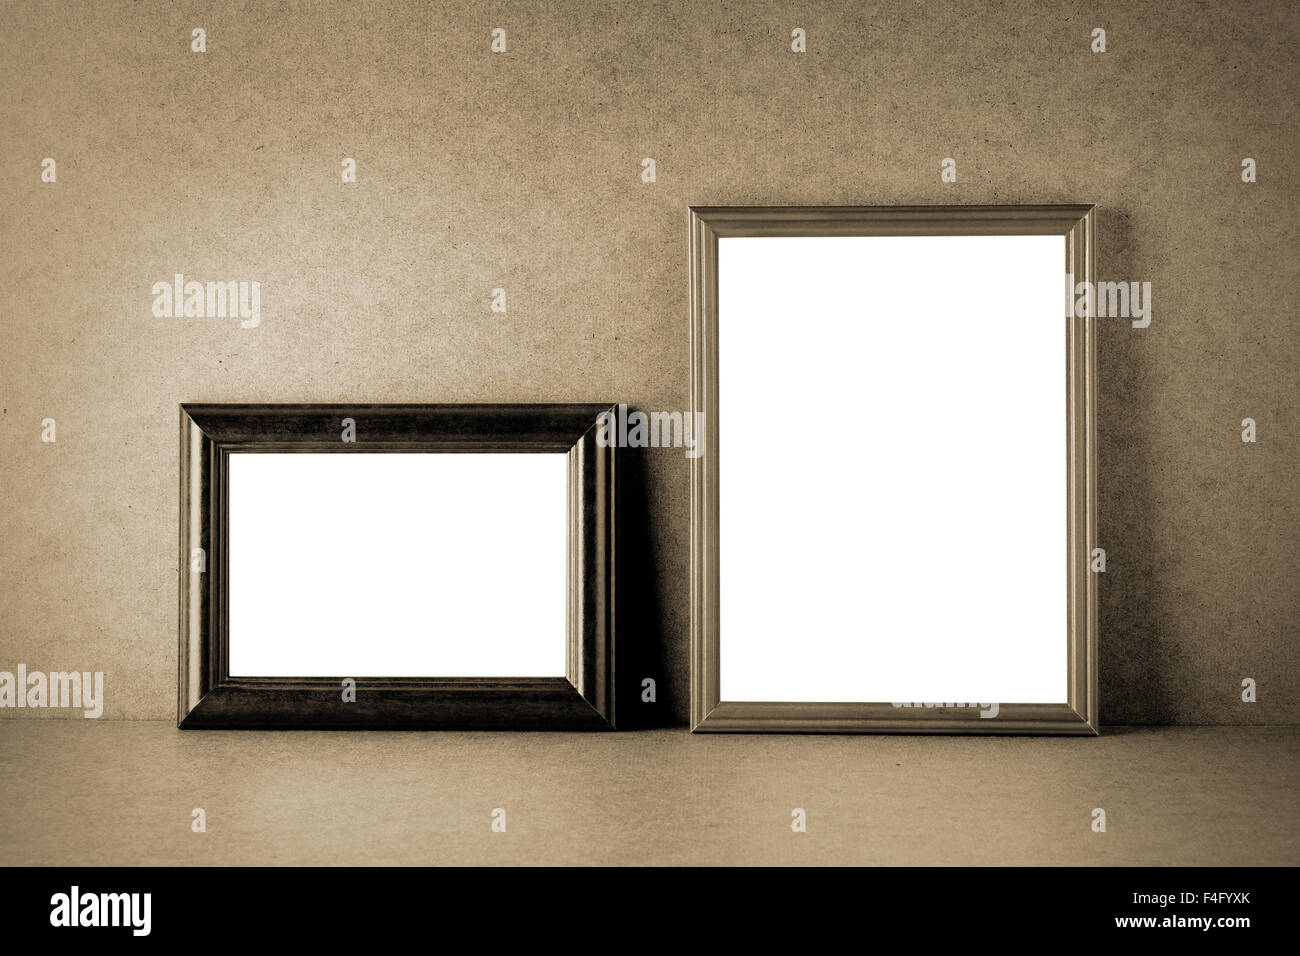 Nett Bildrahmen Grenzt Fotos - Benutzerdefinierte Bilderrahmen Ideen ...